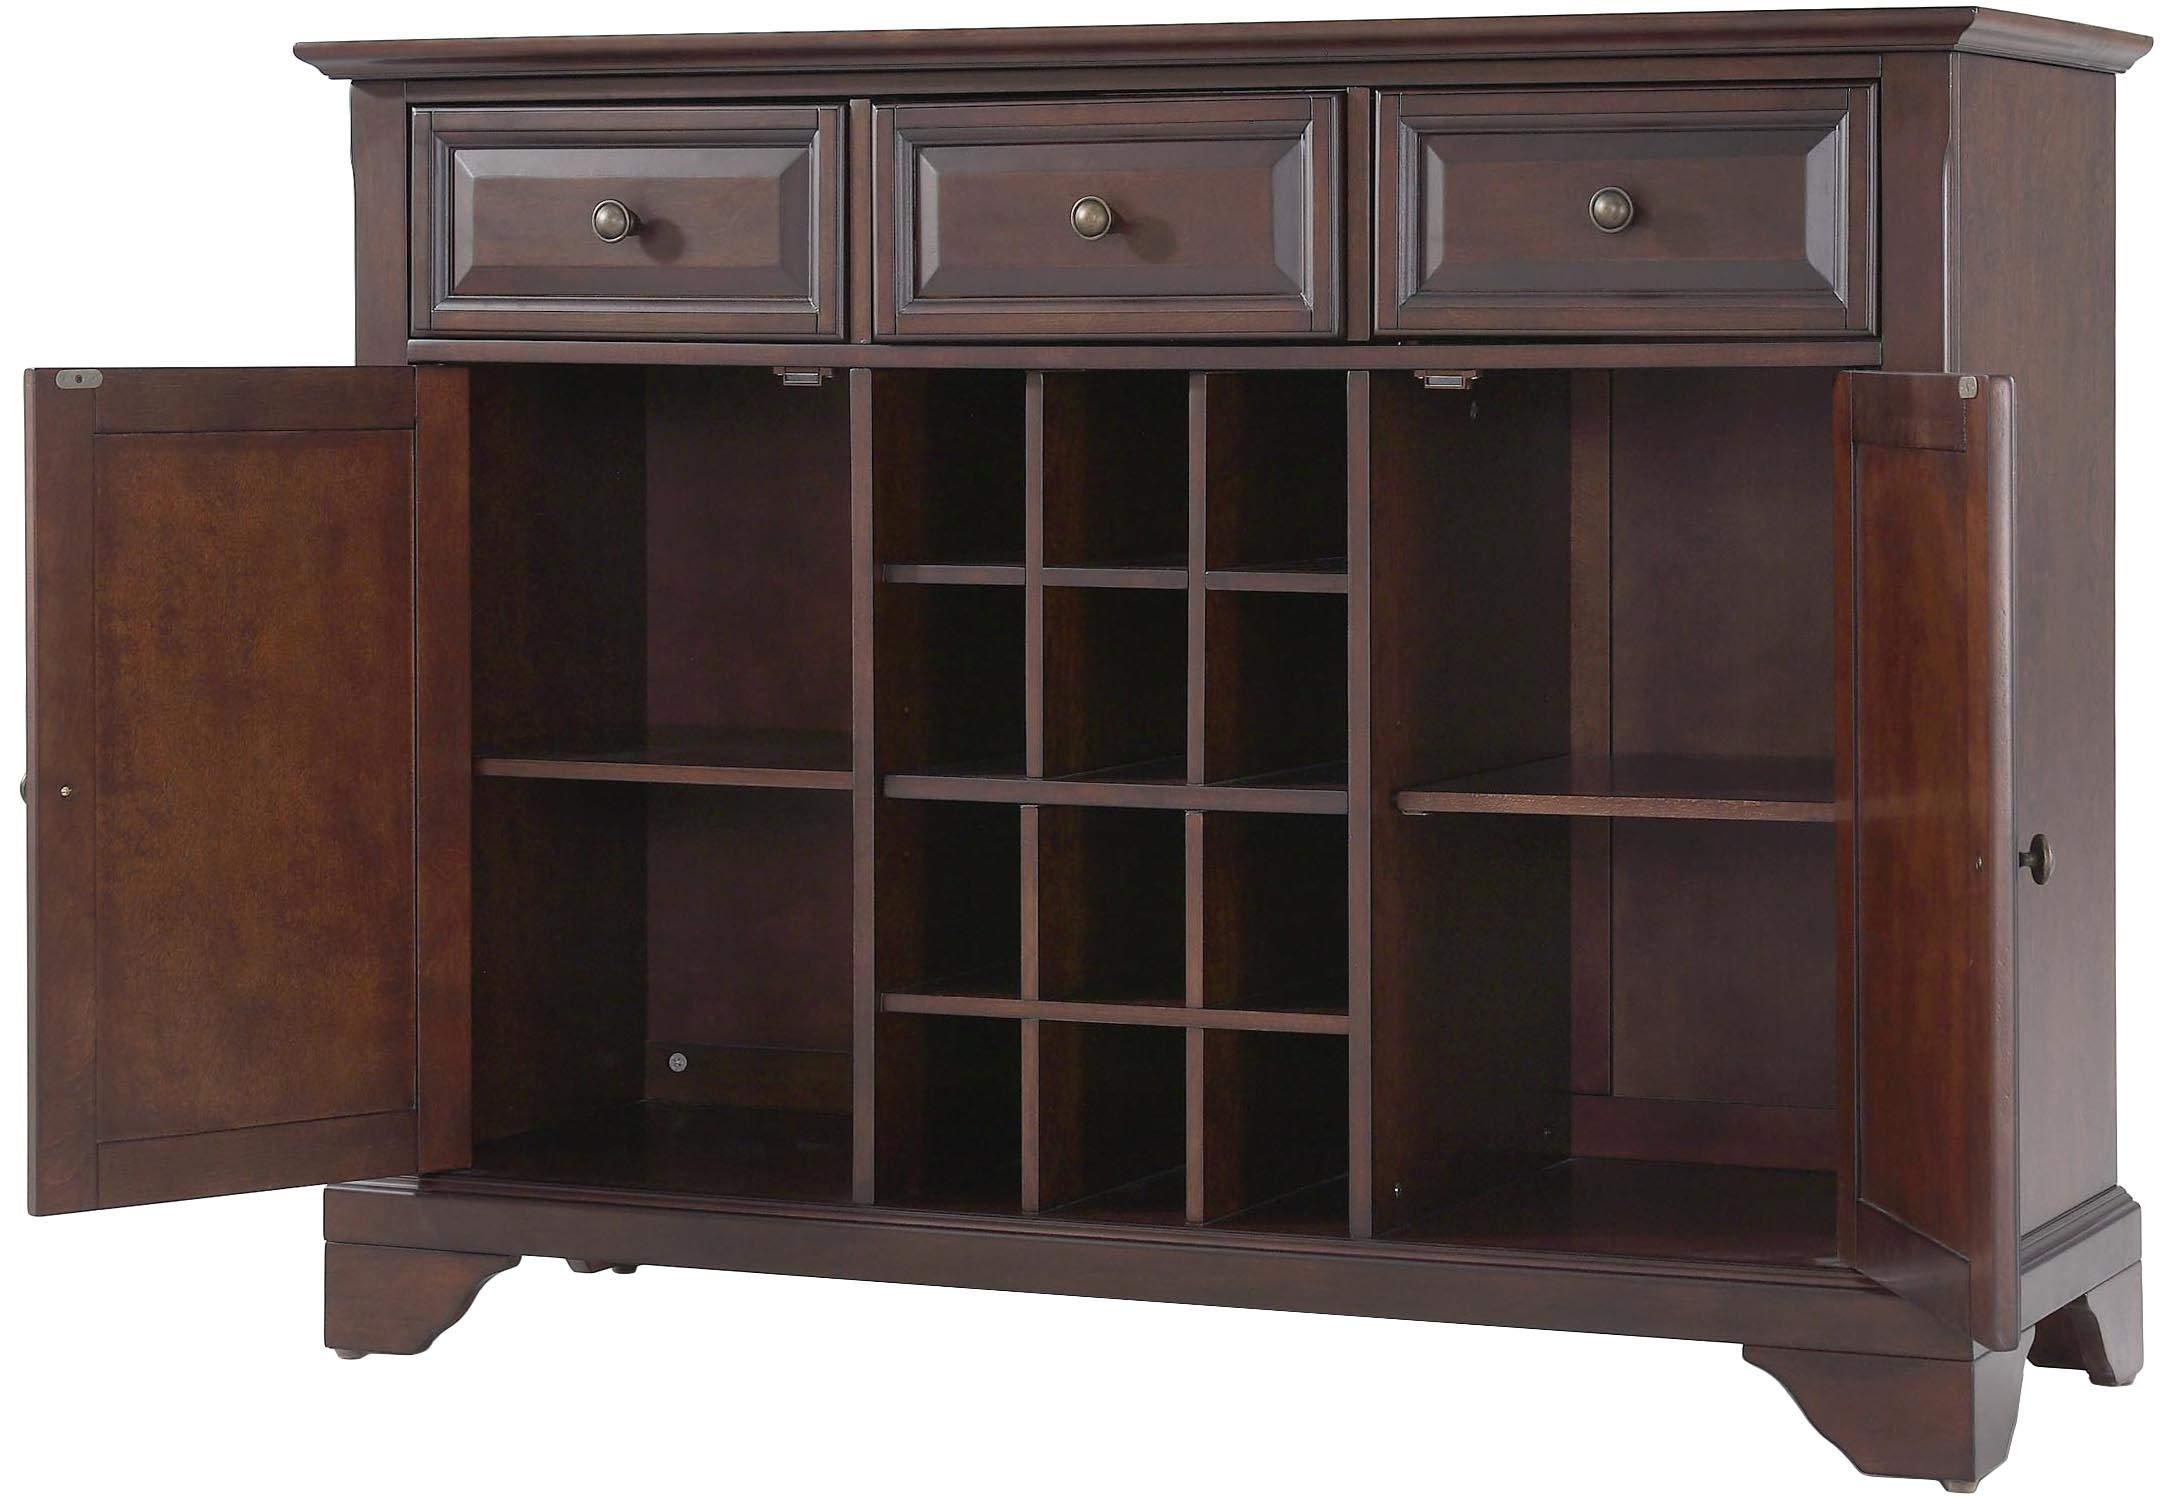 Crosley Furniture LaFayette Wine Buffet / Sideboard - Vintage Mahogany by Crosley Furniture (Image #2)